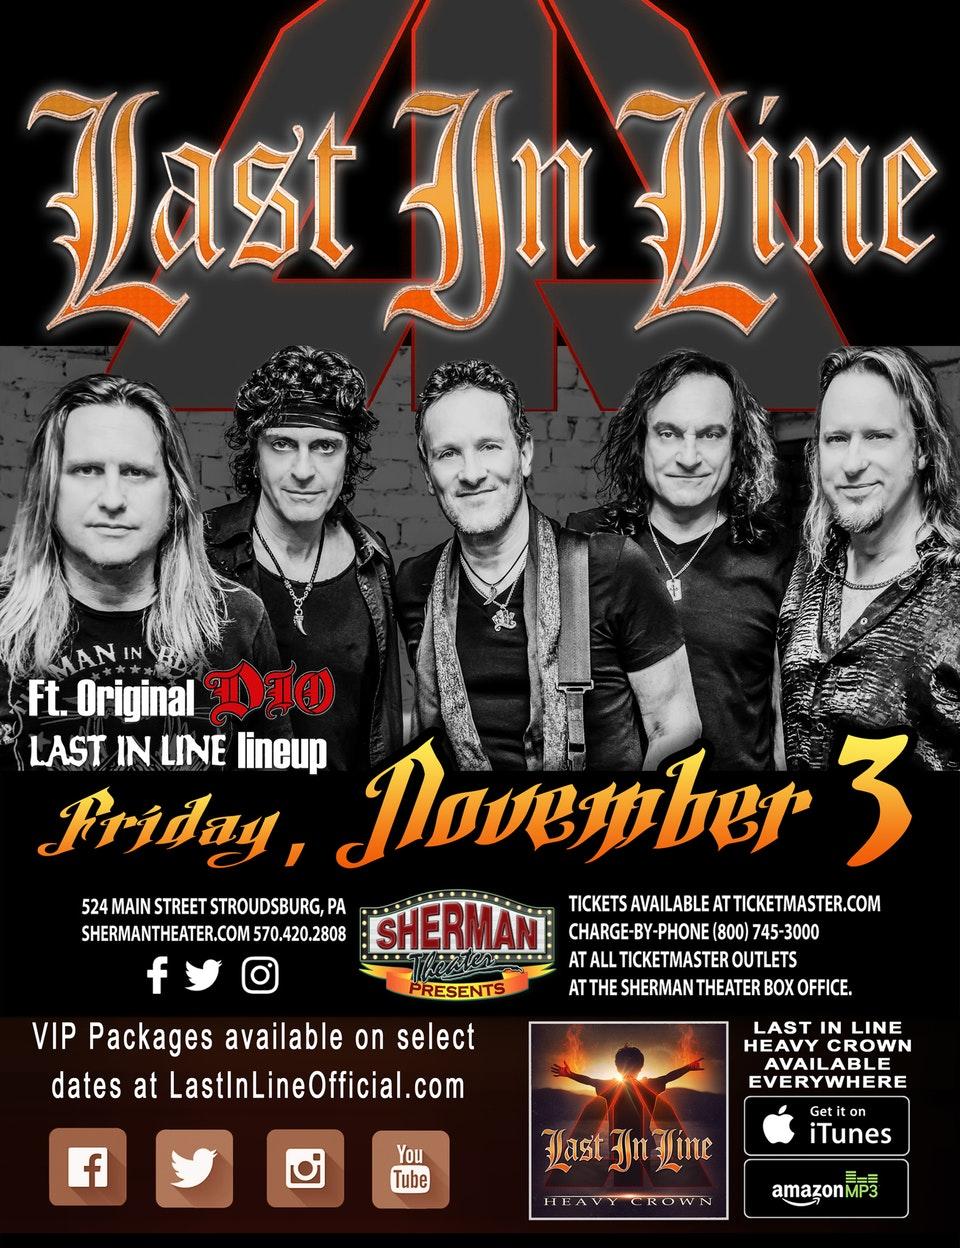 Last in Line Sherman Theater, Stroudsburg, PA November 3rd 2017